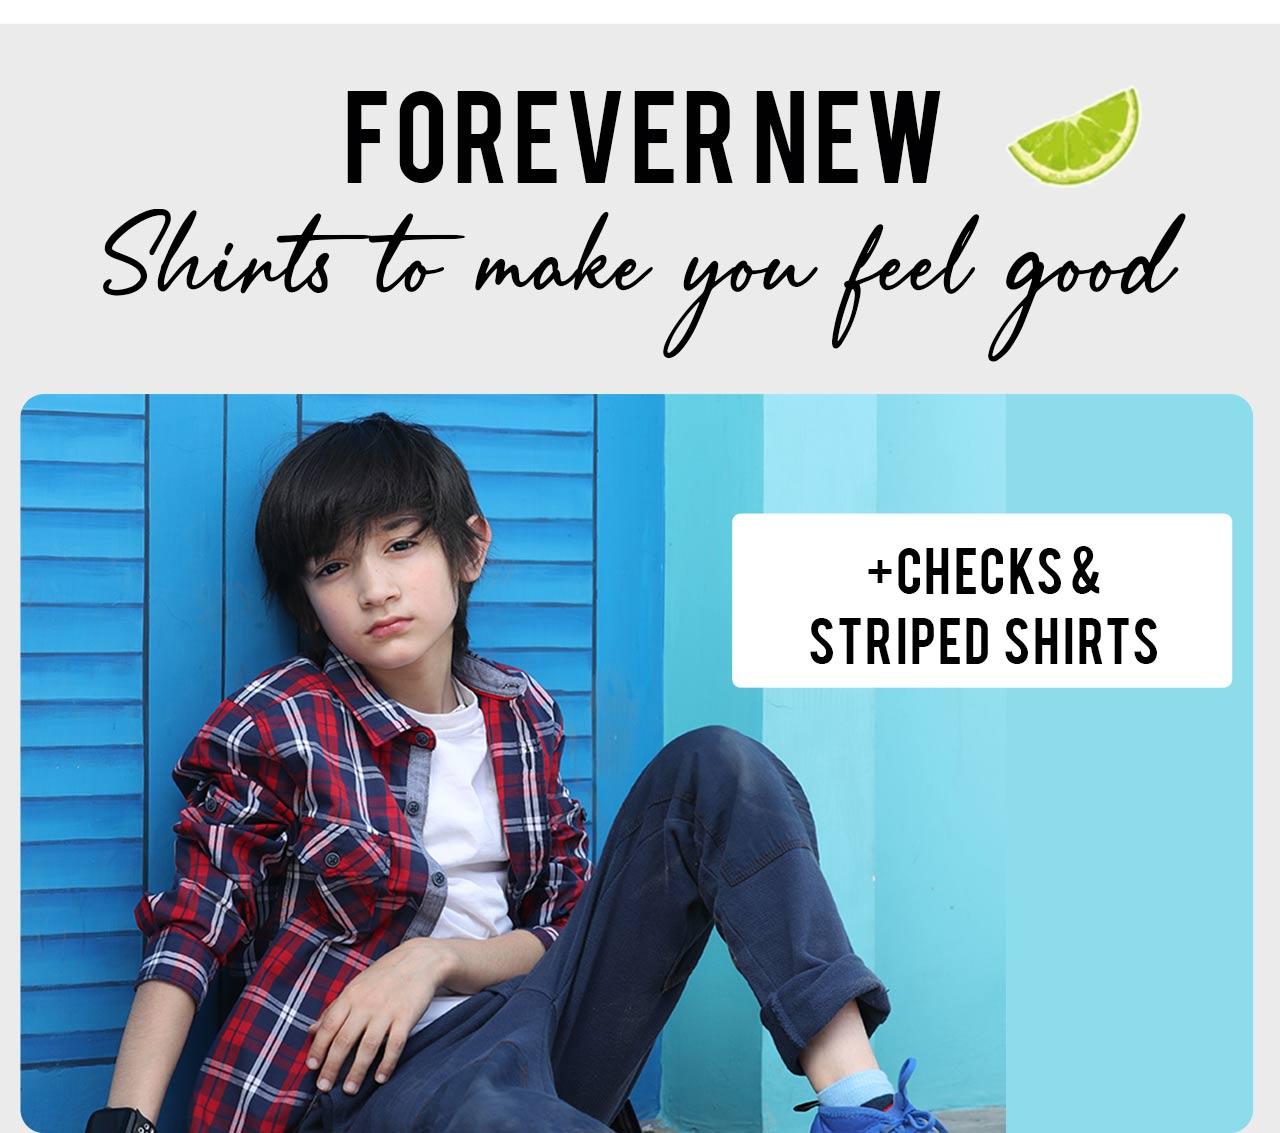 Checks & Striped Shirts